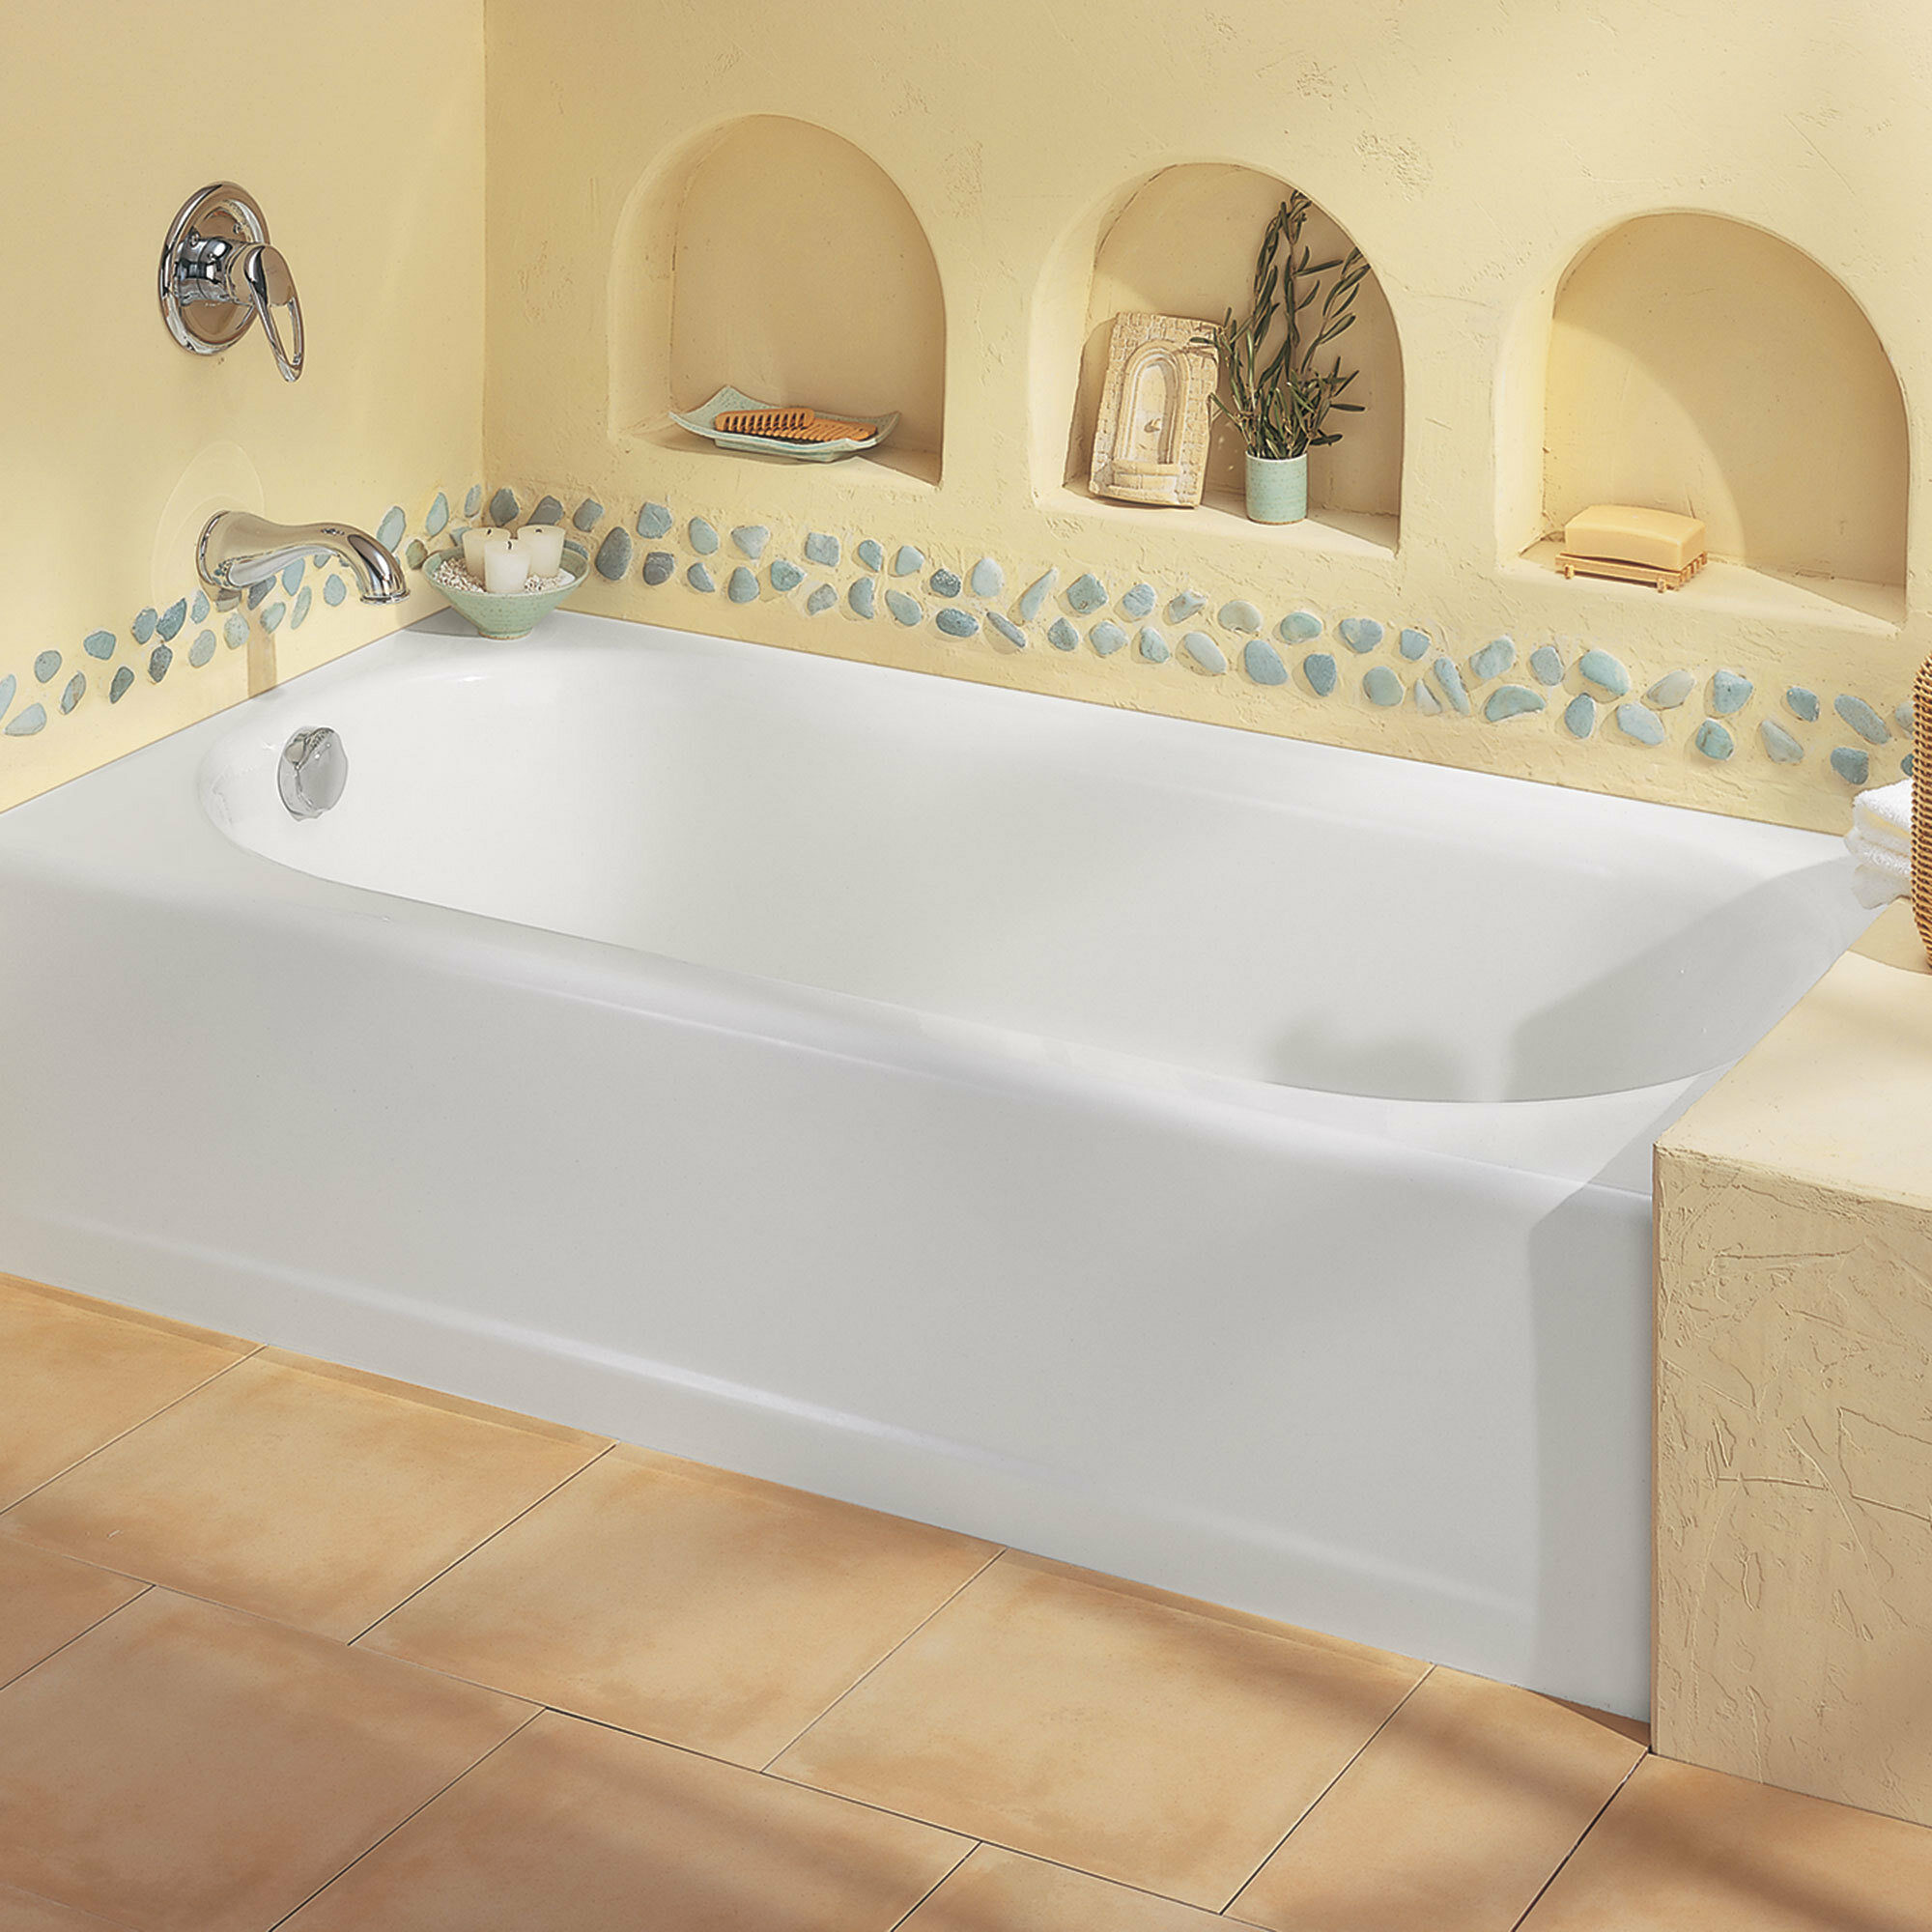 foot villager bath bathroom appealing shower corner kohler resolution hi tub bathtub design bathtubs cozy